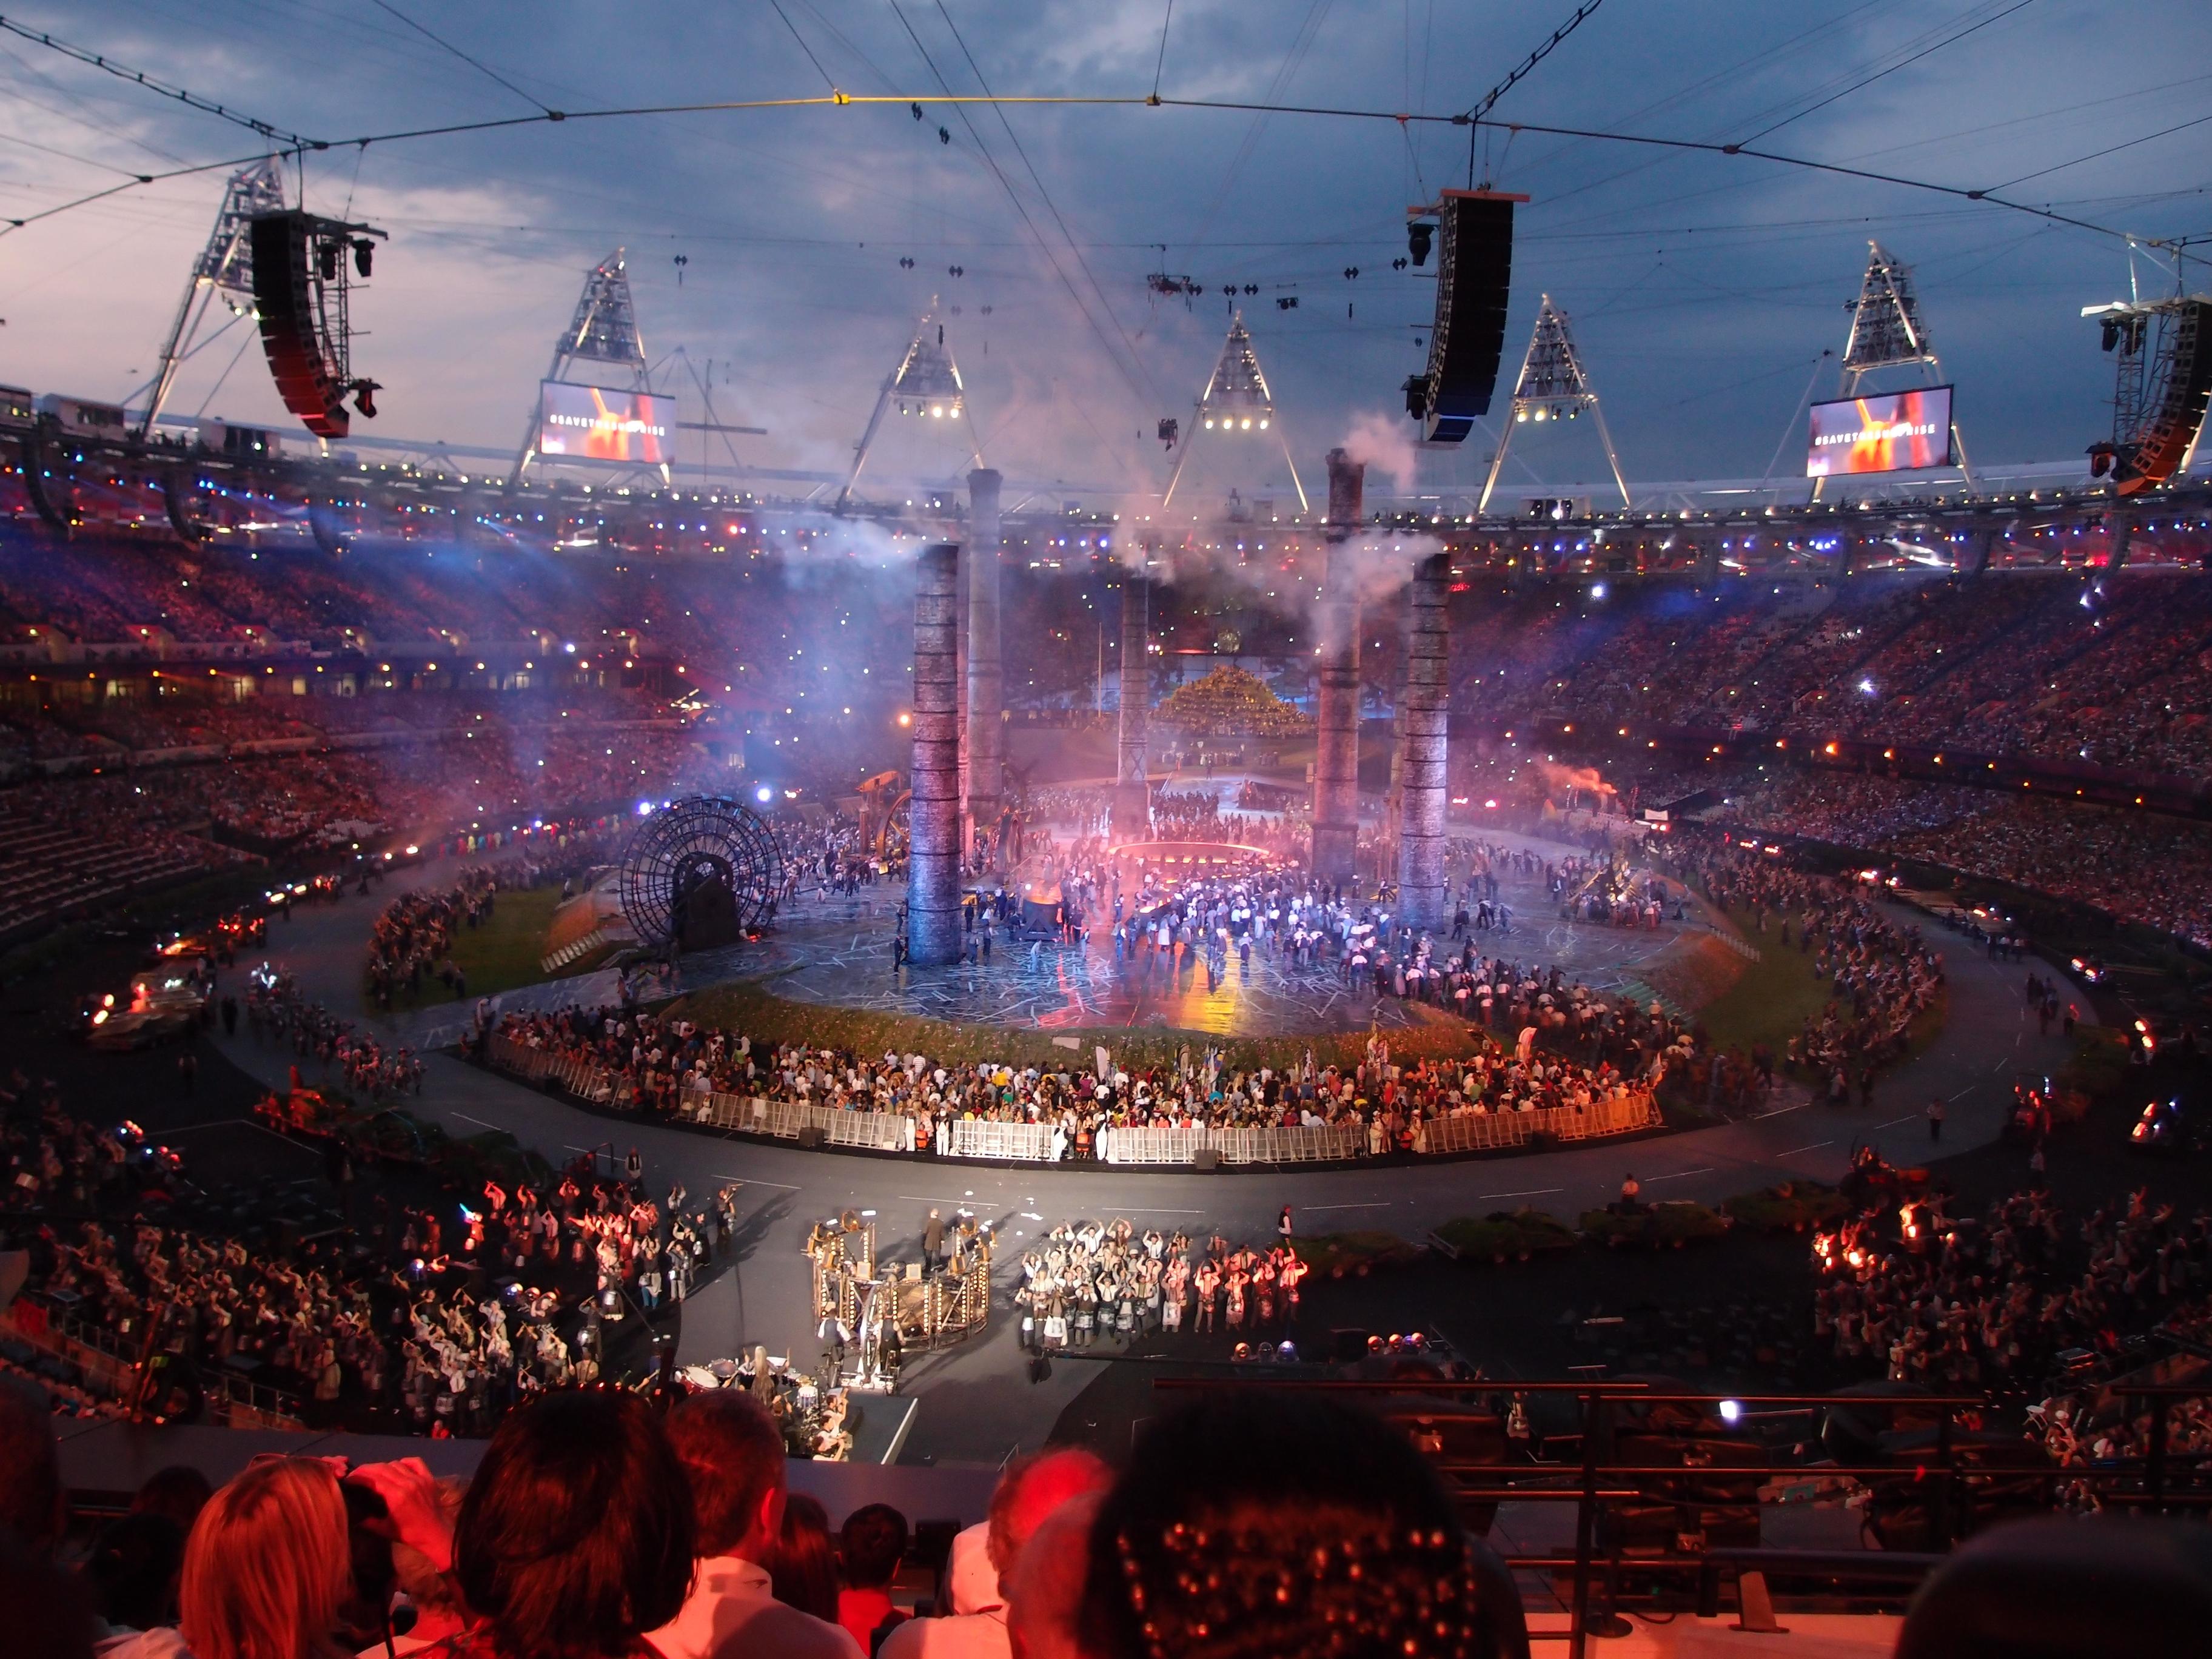 Winter Olympics Opening Ceremony 2020 Nbc.2012 Summer Olympics Opening Ceremony Wikipedia